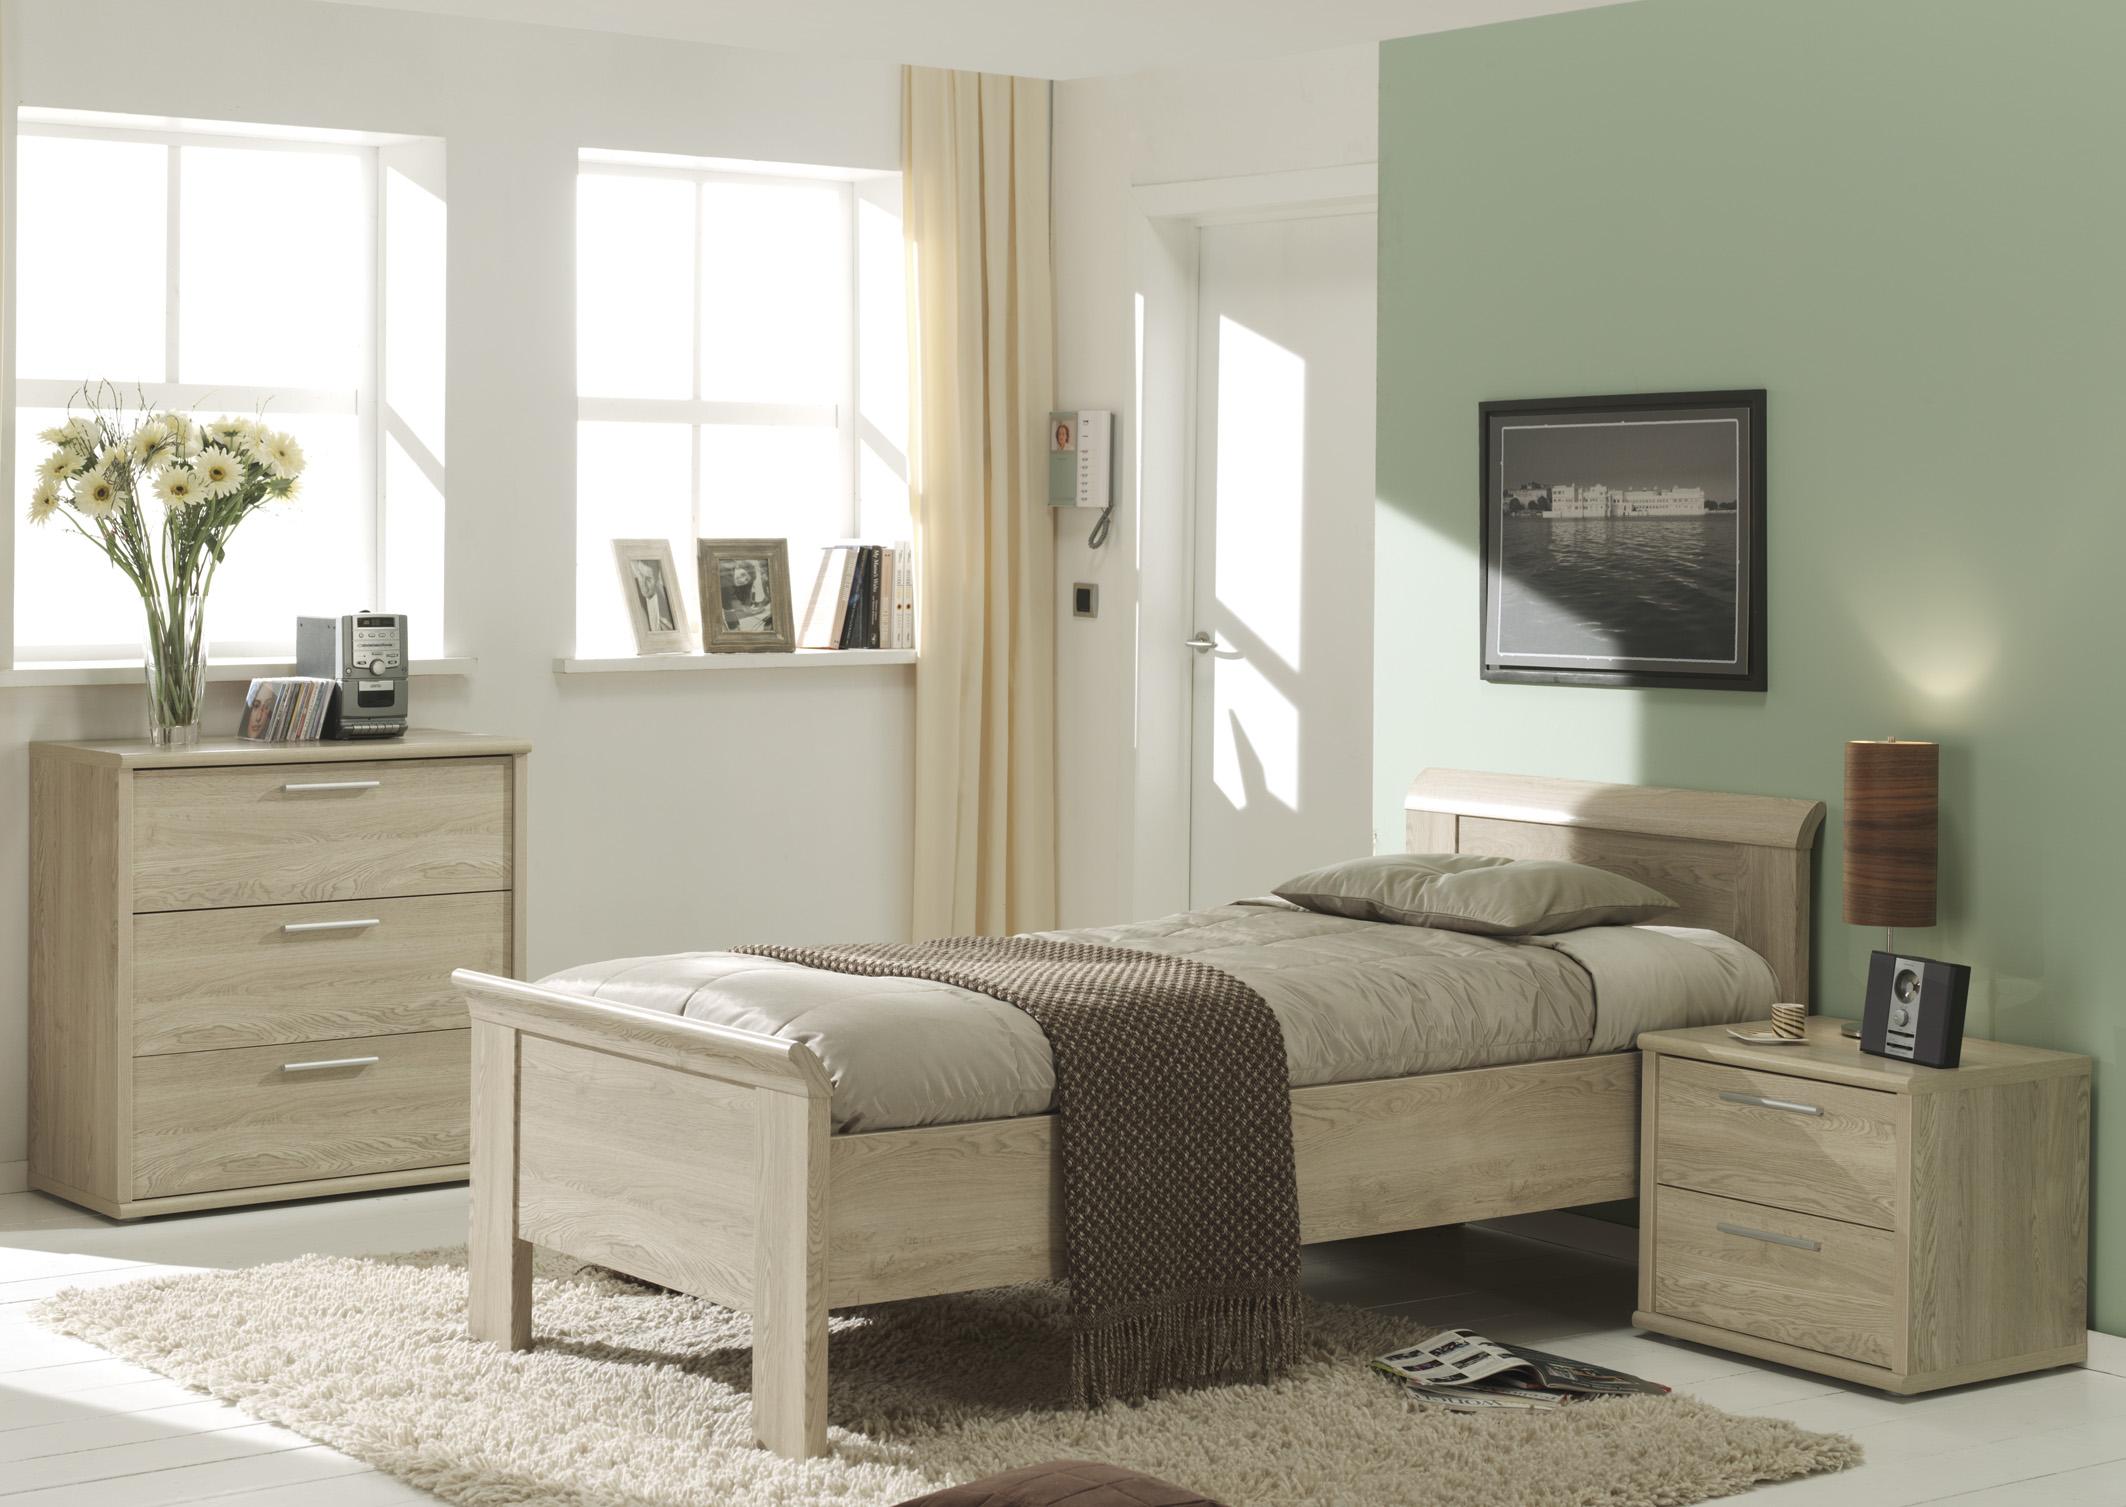 Feng shui slaapkamer bureau for - Schilderij slaapkamer kind ...